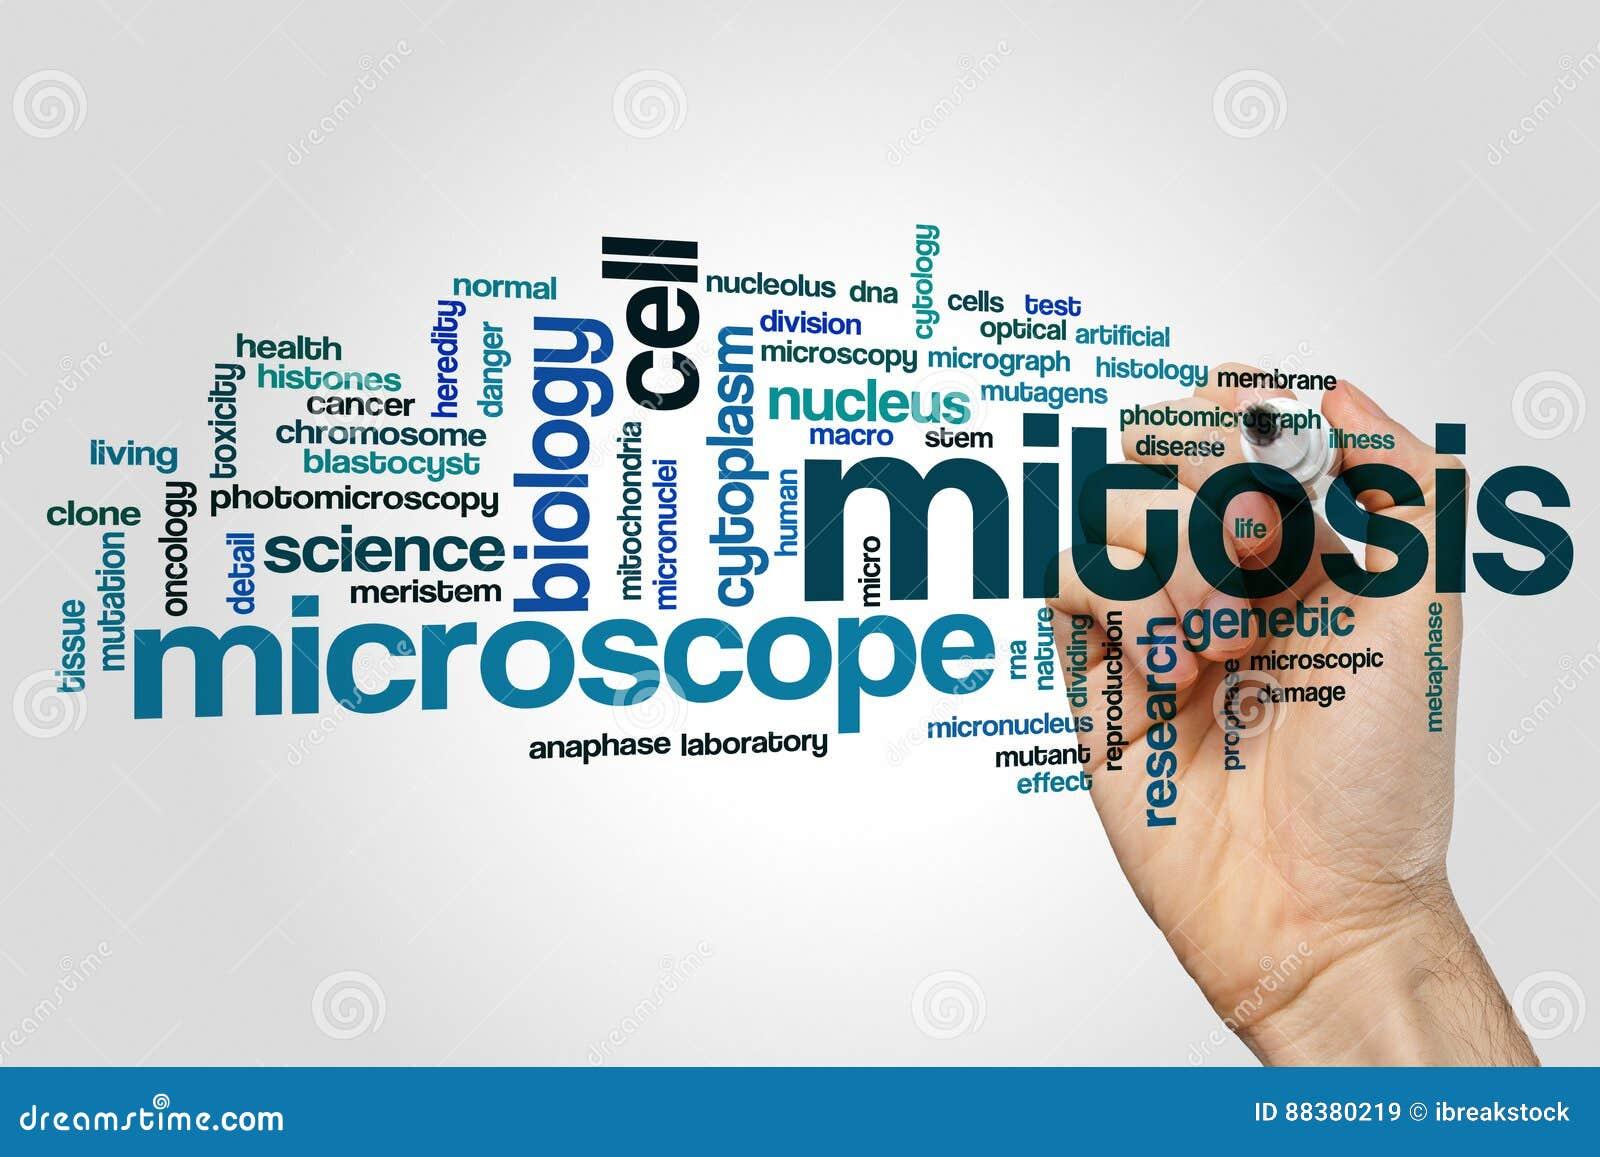 Mitosis word cloud